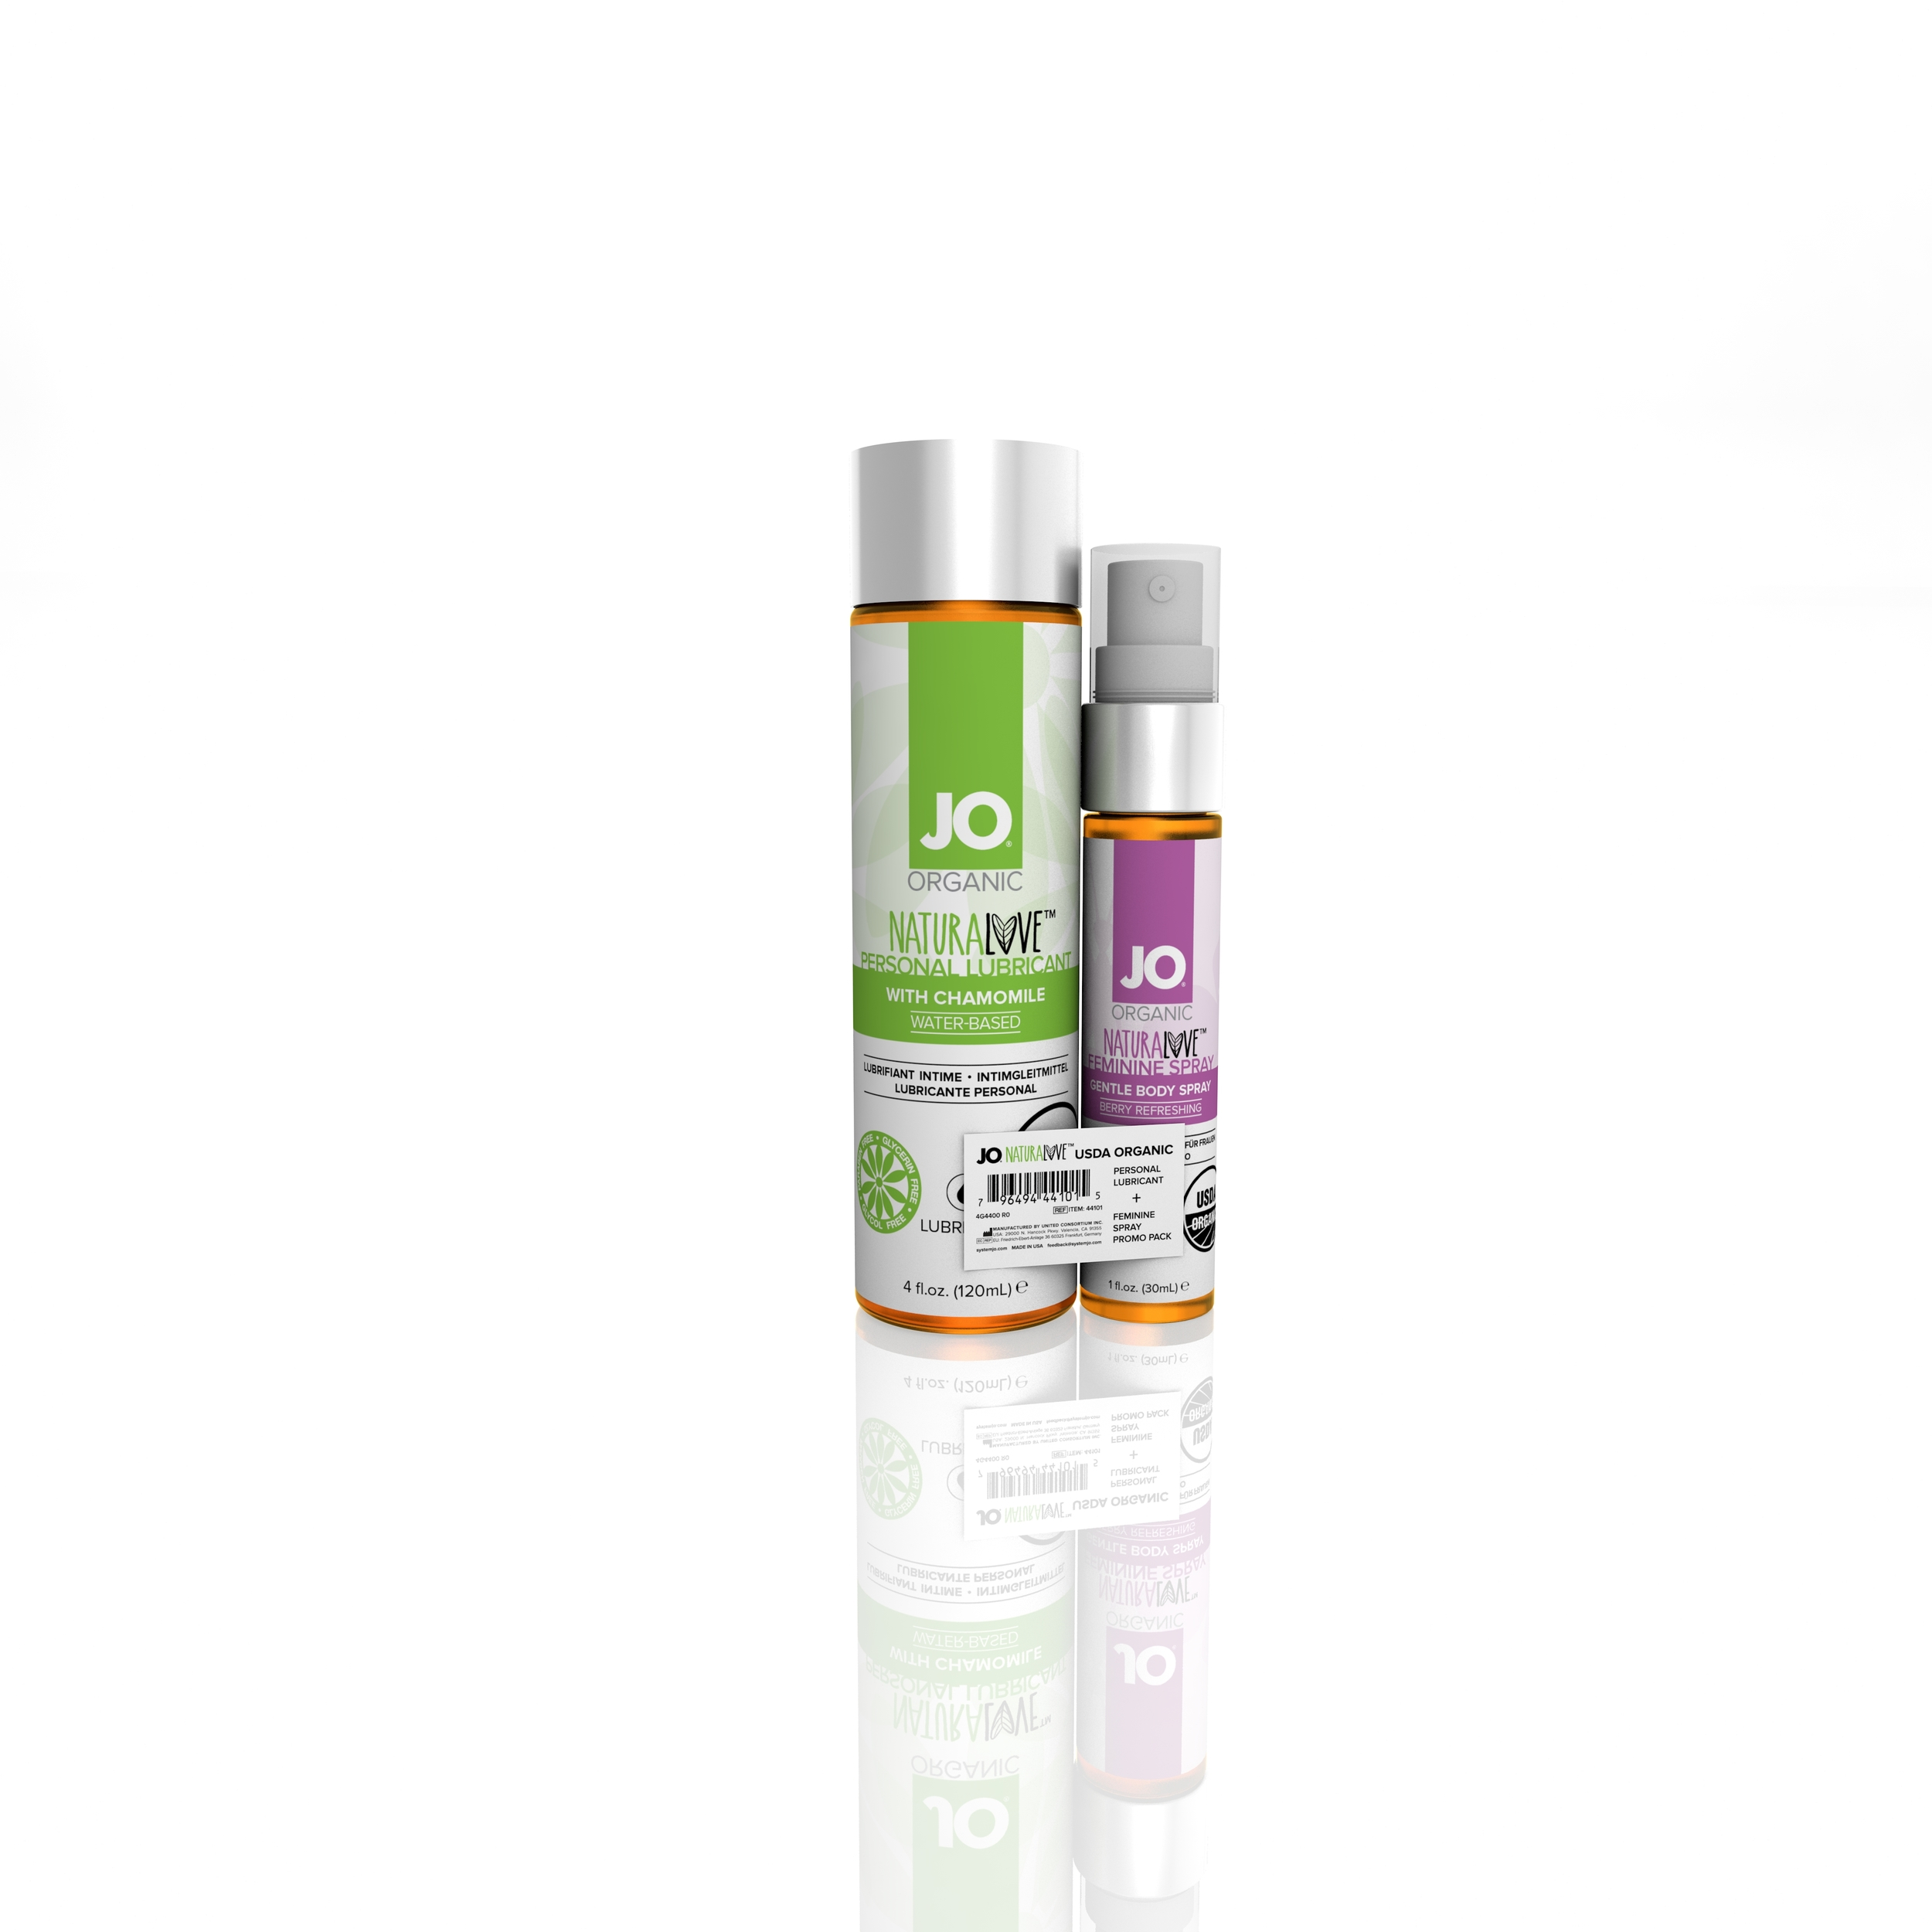 JO USDA Organic Promo Pack (straight on) (white)001.jpg